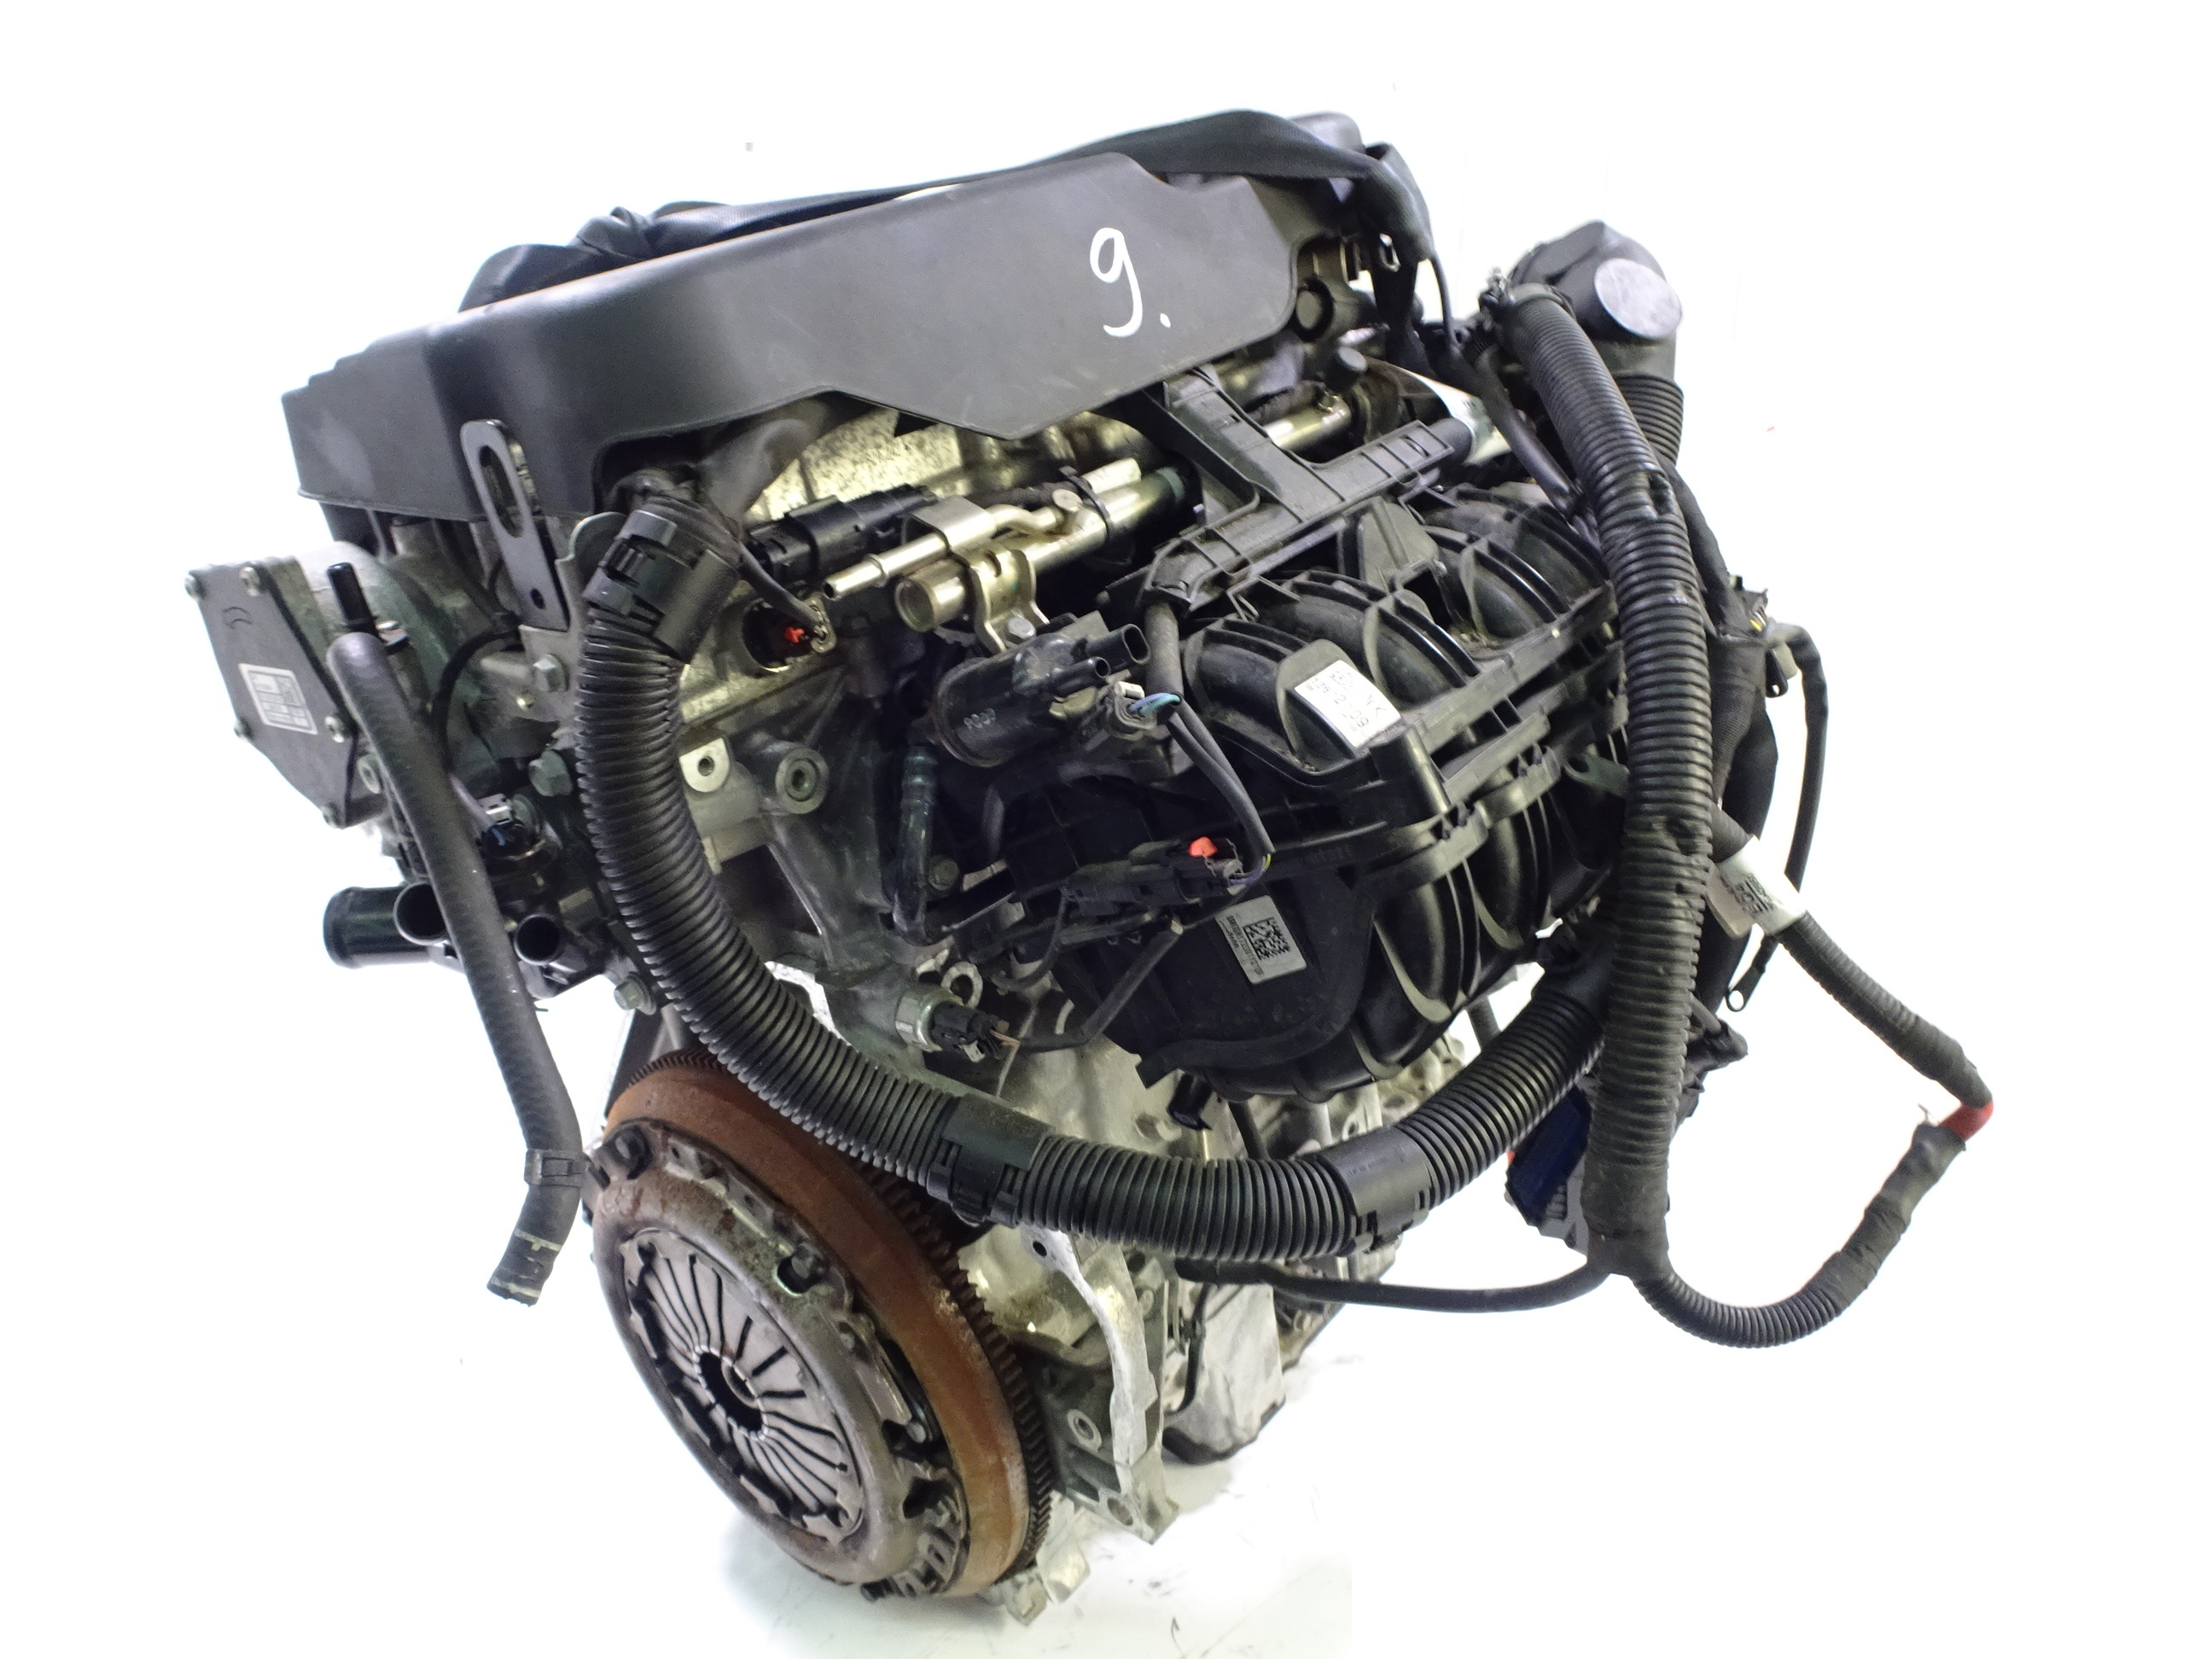 Motor 2016 Opel Astra K B16 1,4 B14XE LE2 100 PS